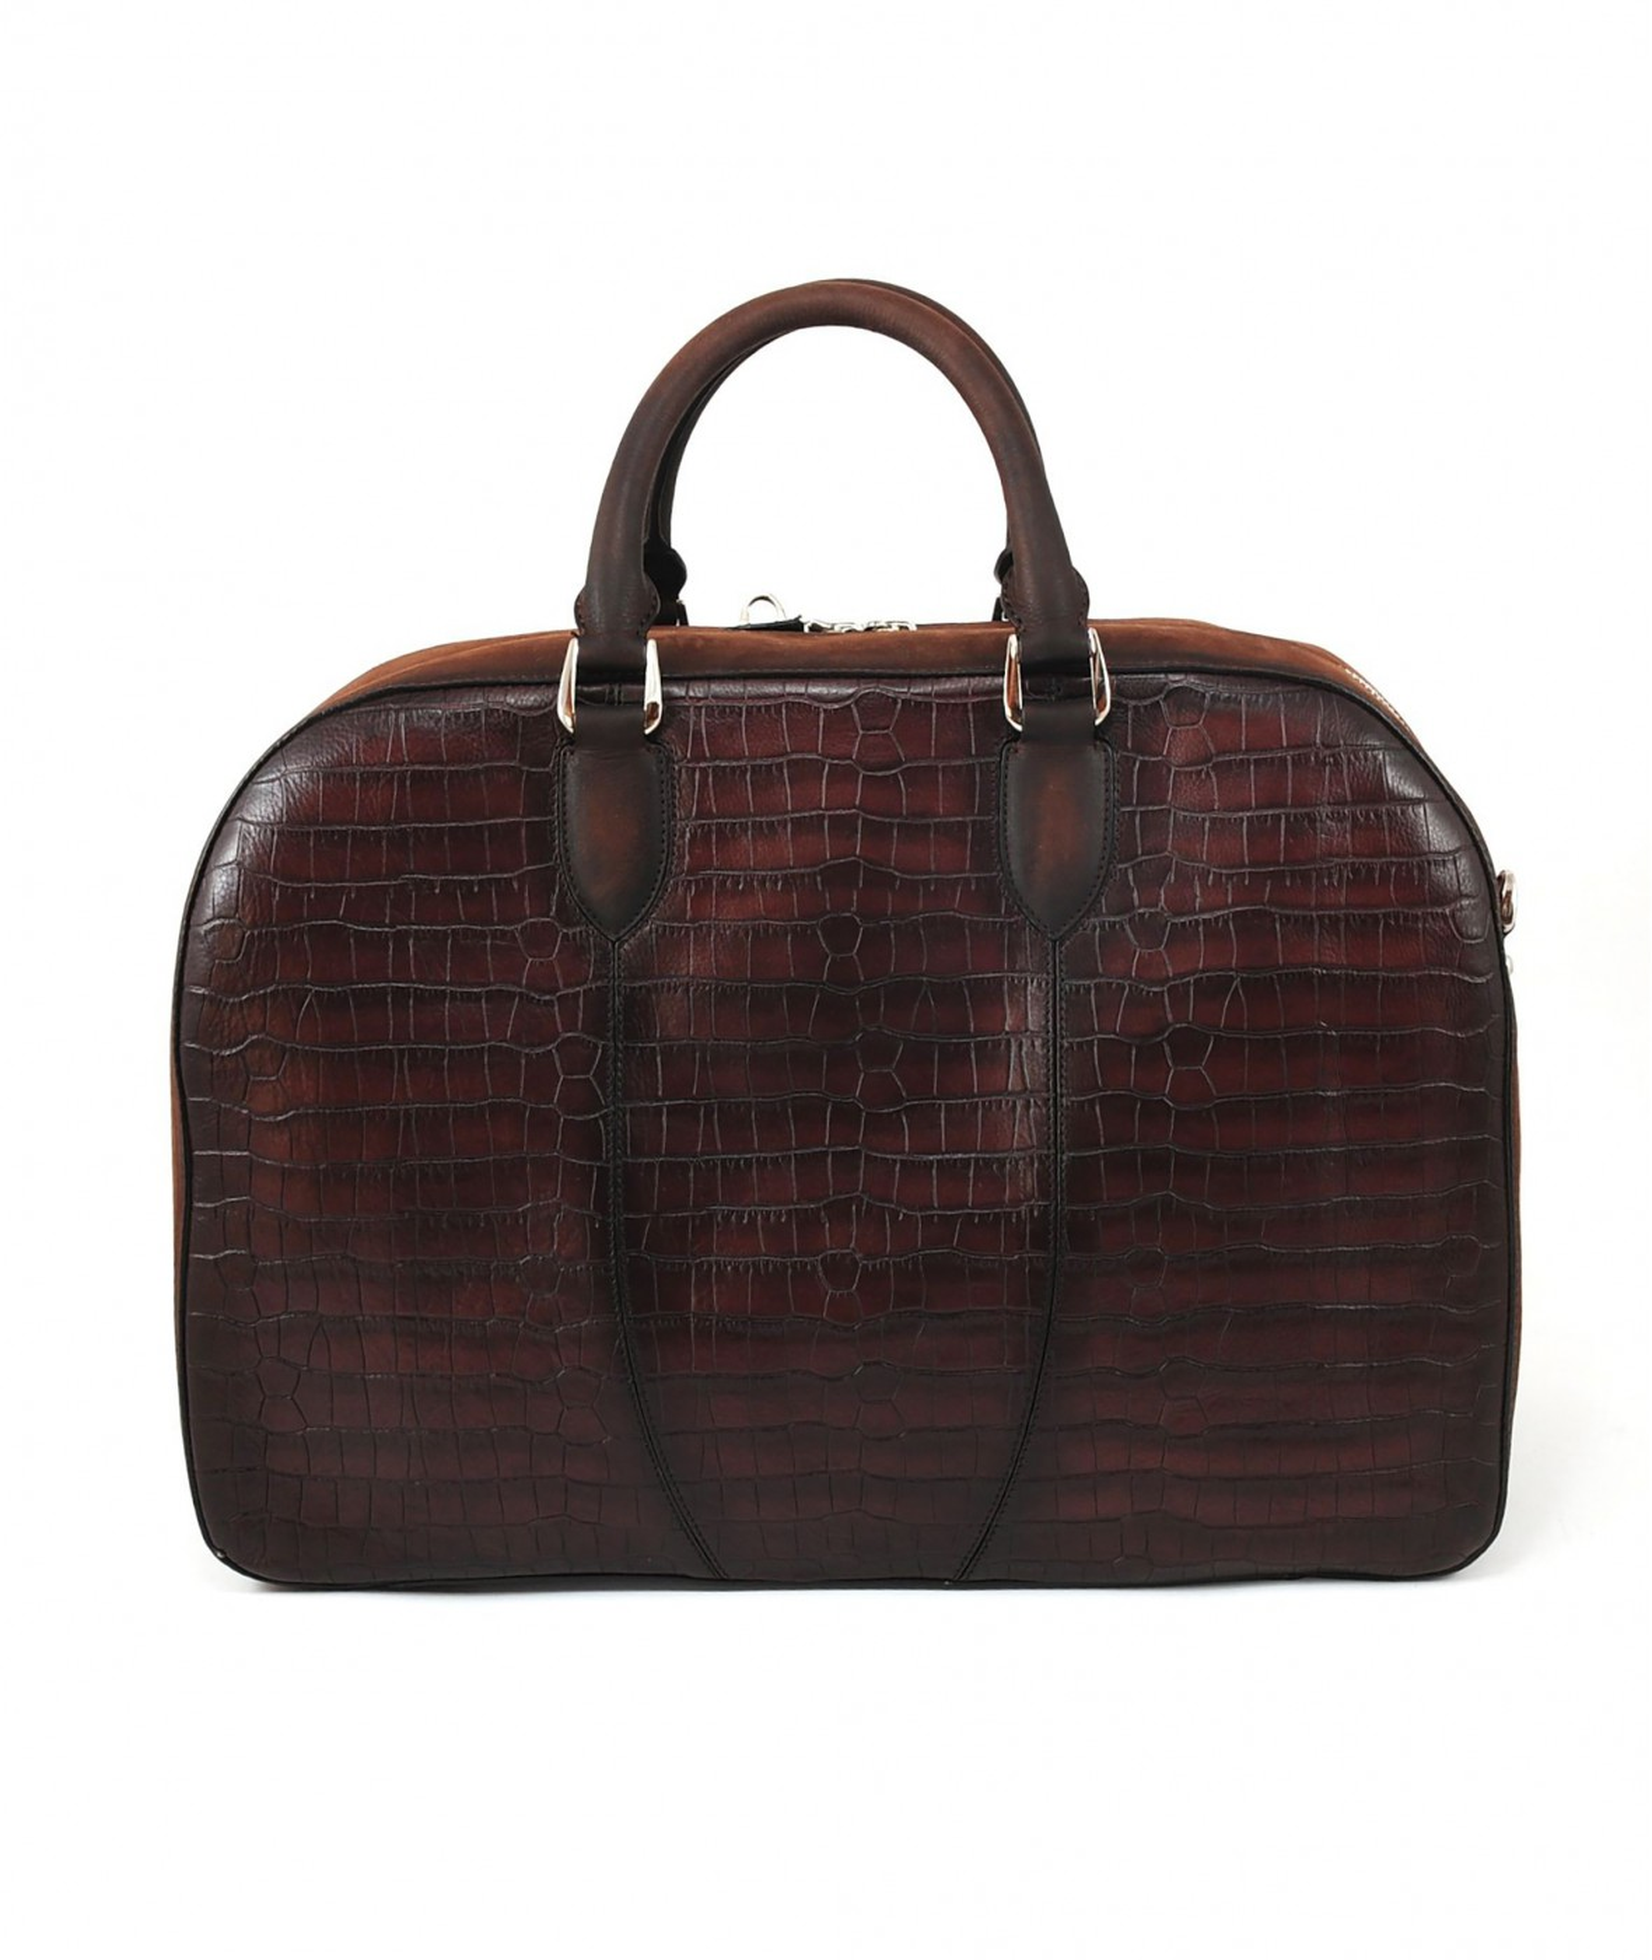 Santoni Large Handbag (24036)